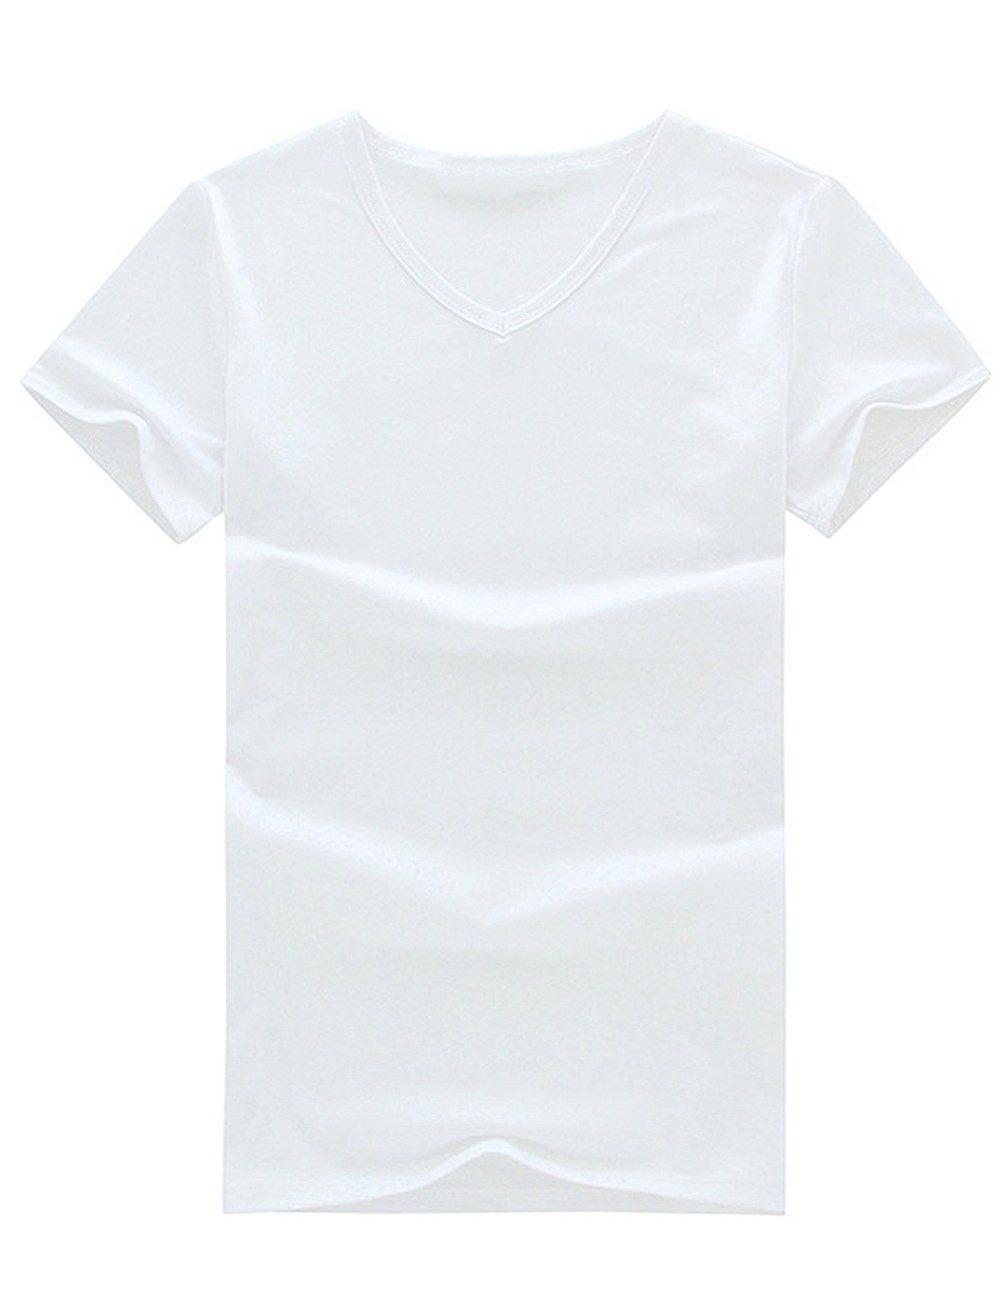 2016 Summer New Men's Tops Tees Cotton V Neck Short Sleeve t shirt Men Fashion Fitness tshirt  M-3XL  NTX01